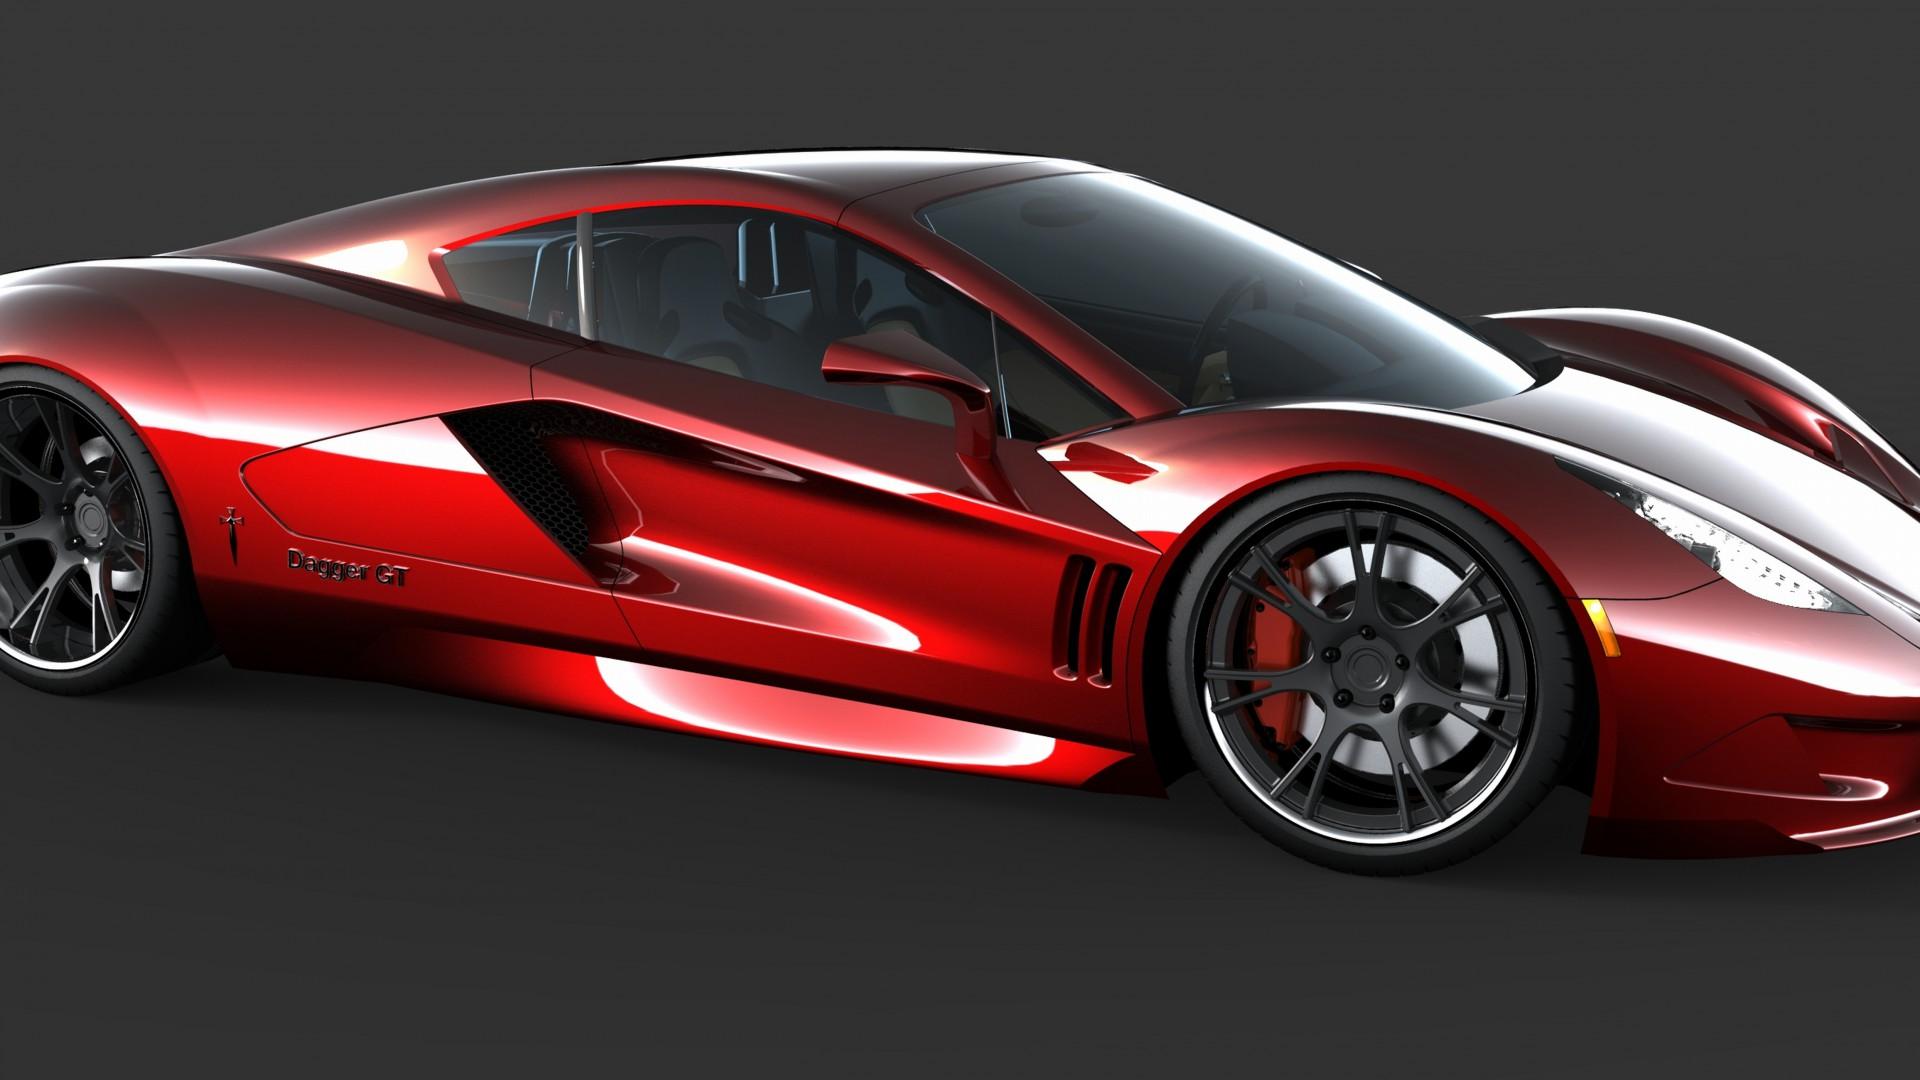 Wallpaper Transtar Dagger GT Supercar Sports Car Luxury Cars Review Test Drive Top Gear